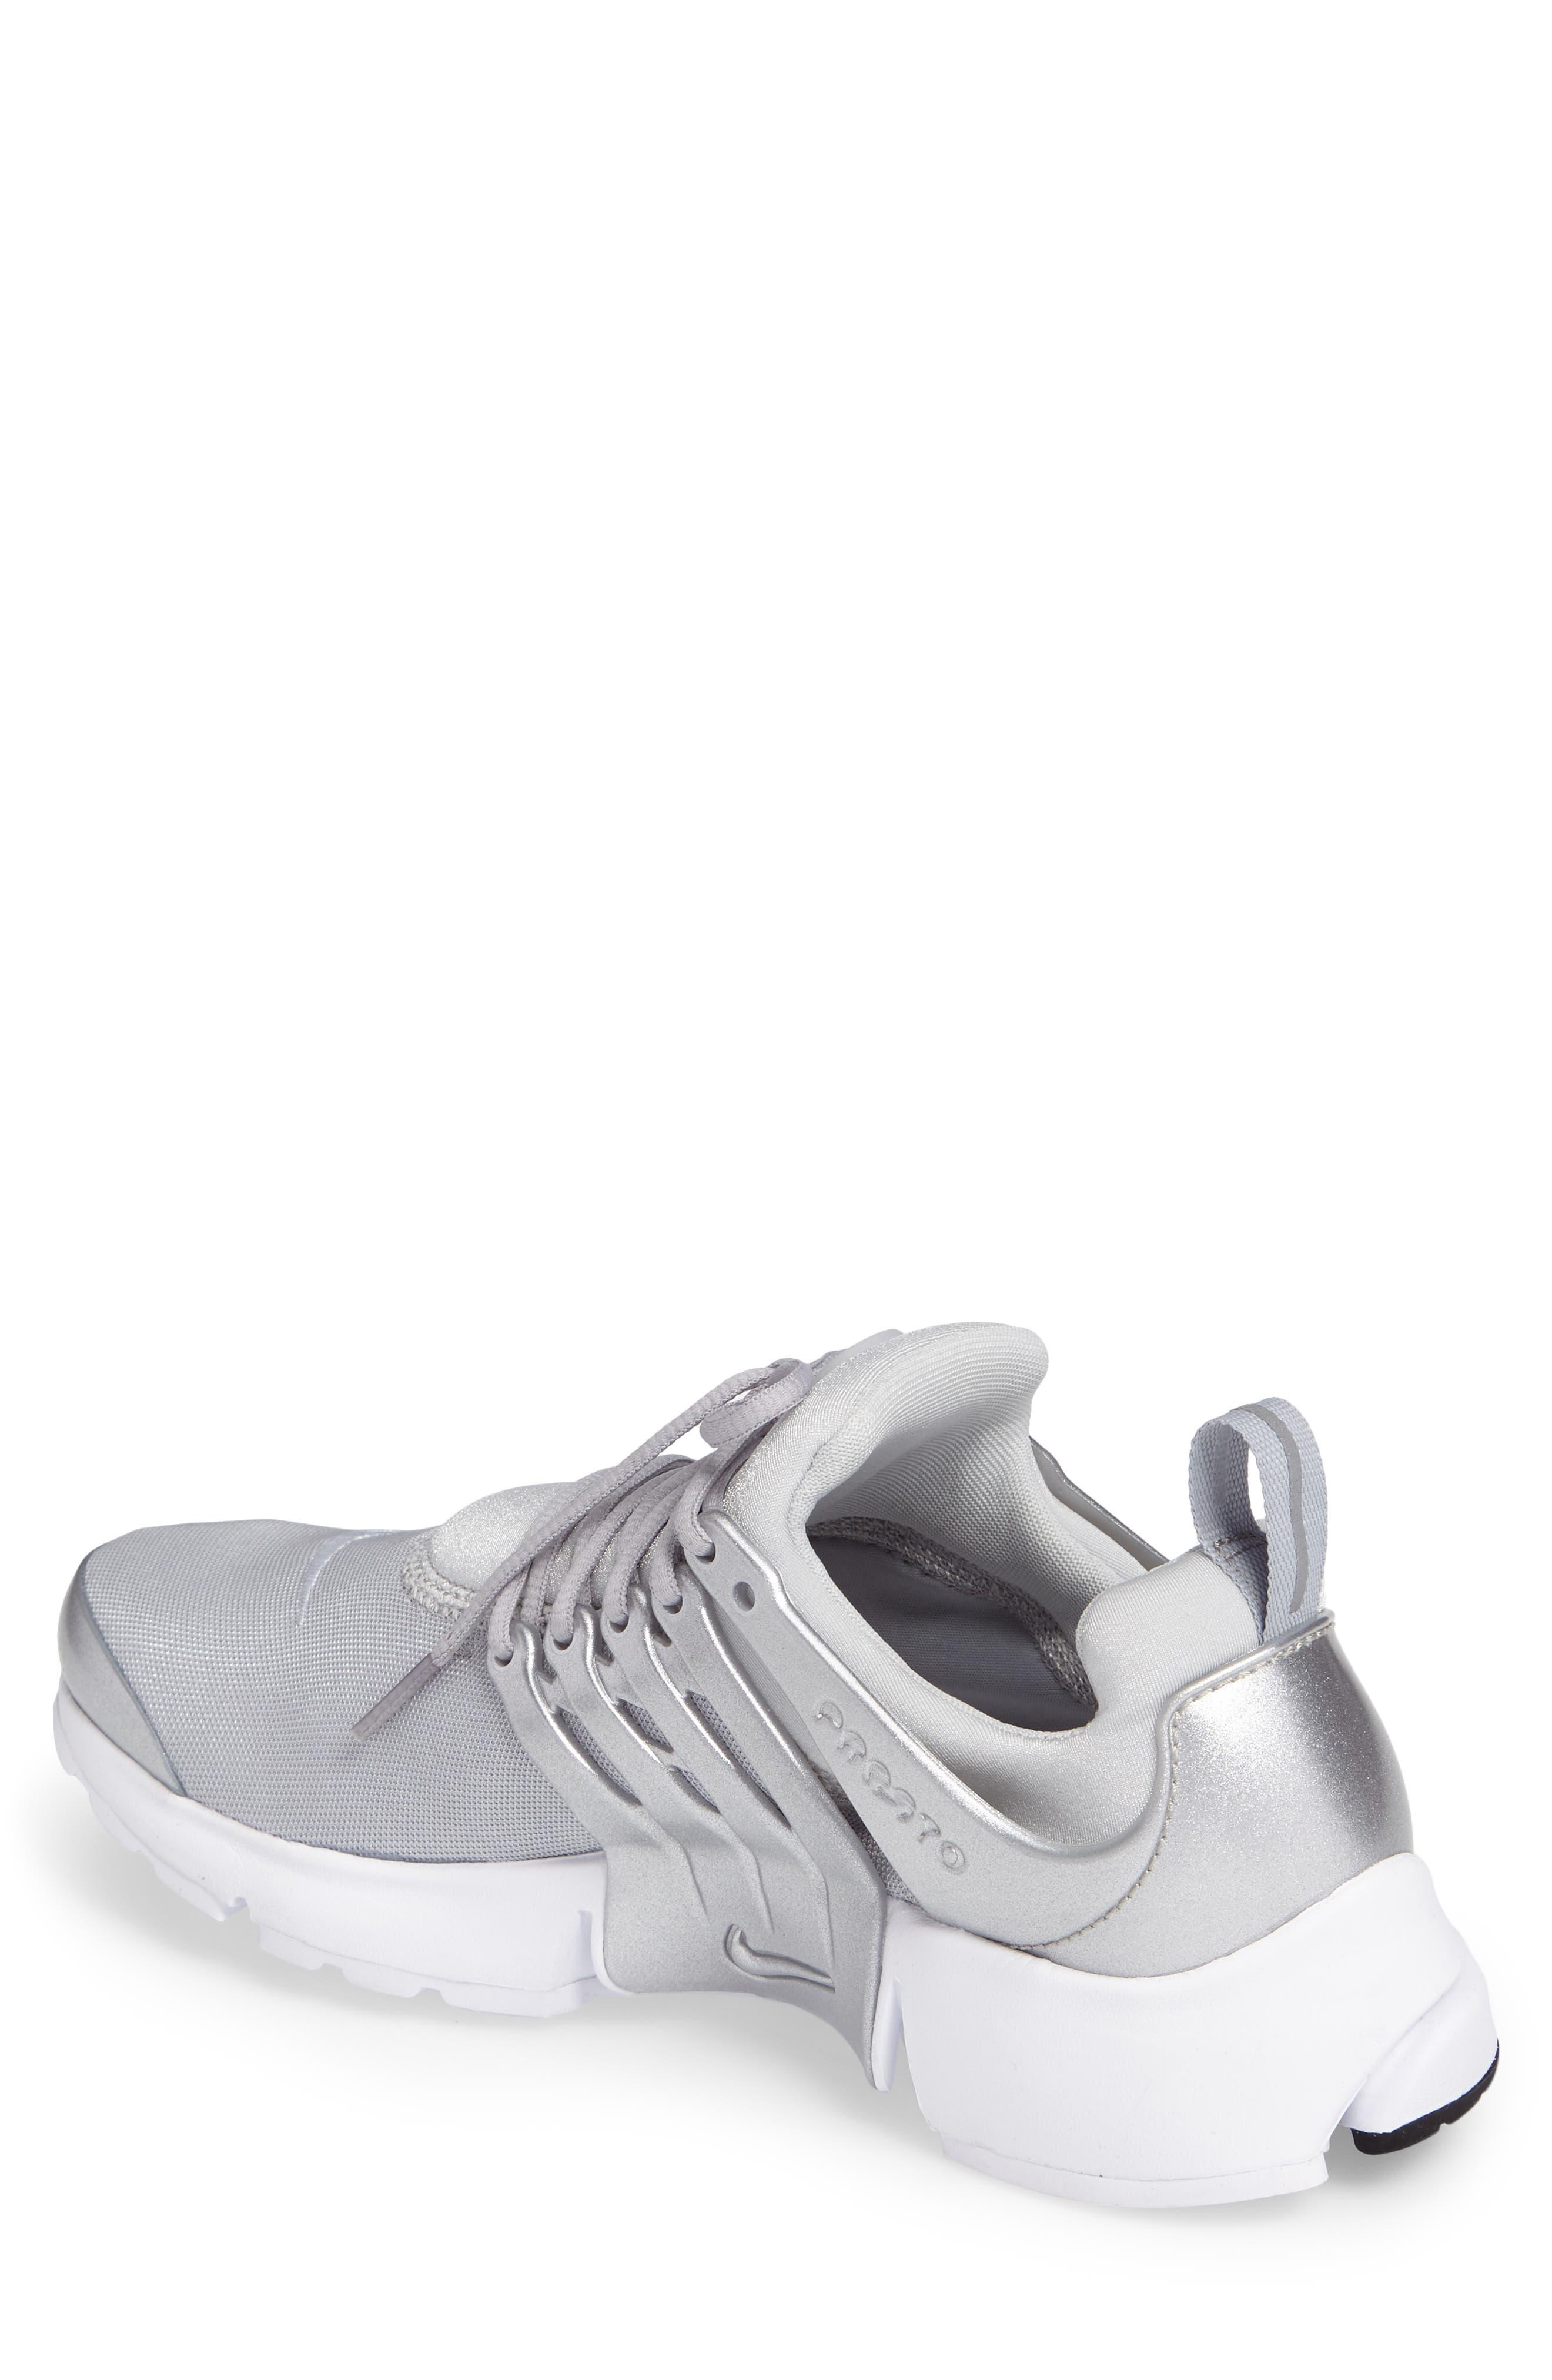 Air Presto Premium Sneaker,                             Alternate thumbnail 2, color,                             021